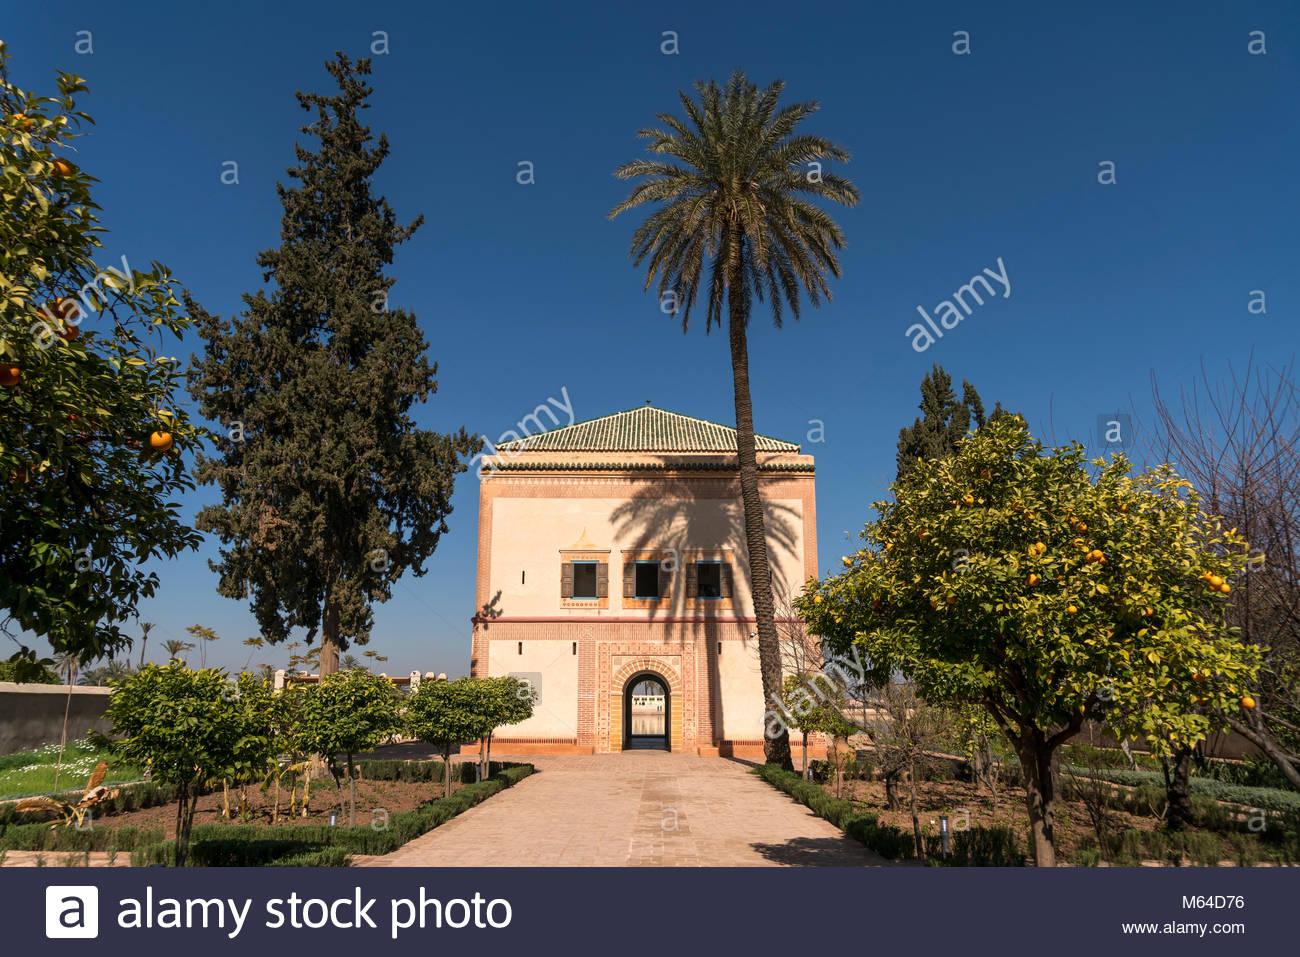 pavillon im menara garten marrakesch knigreich marokko afrika saadian M64D76